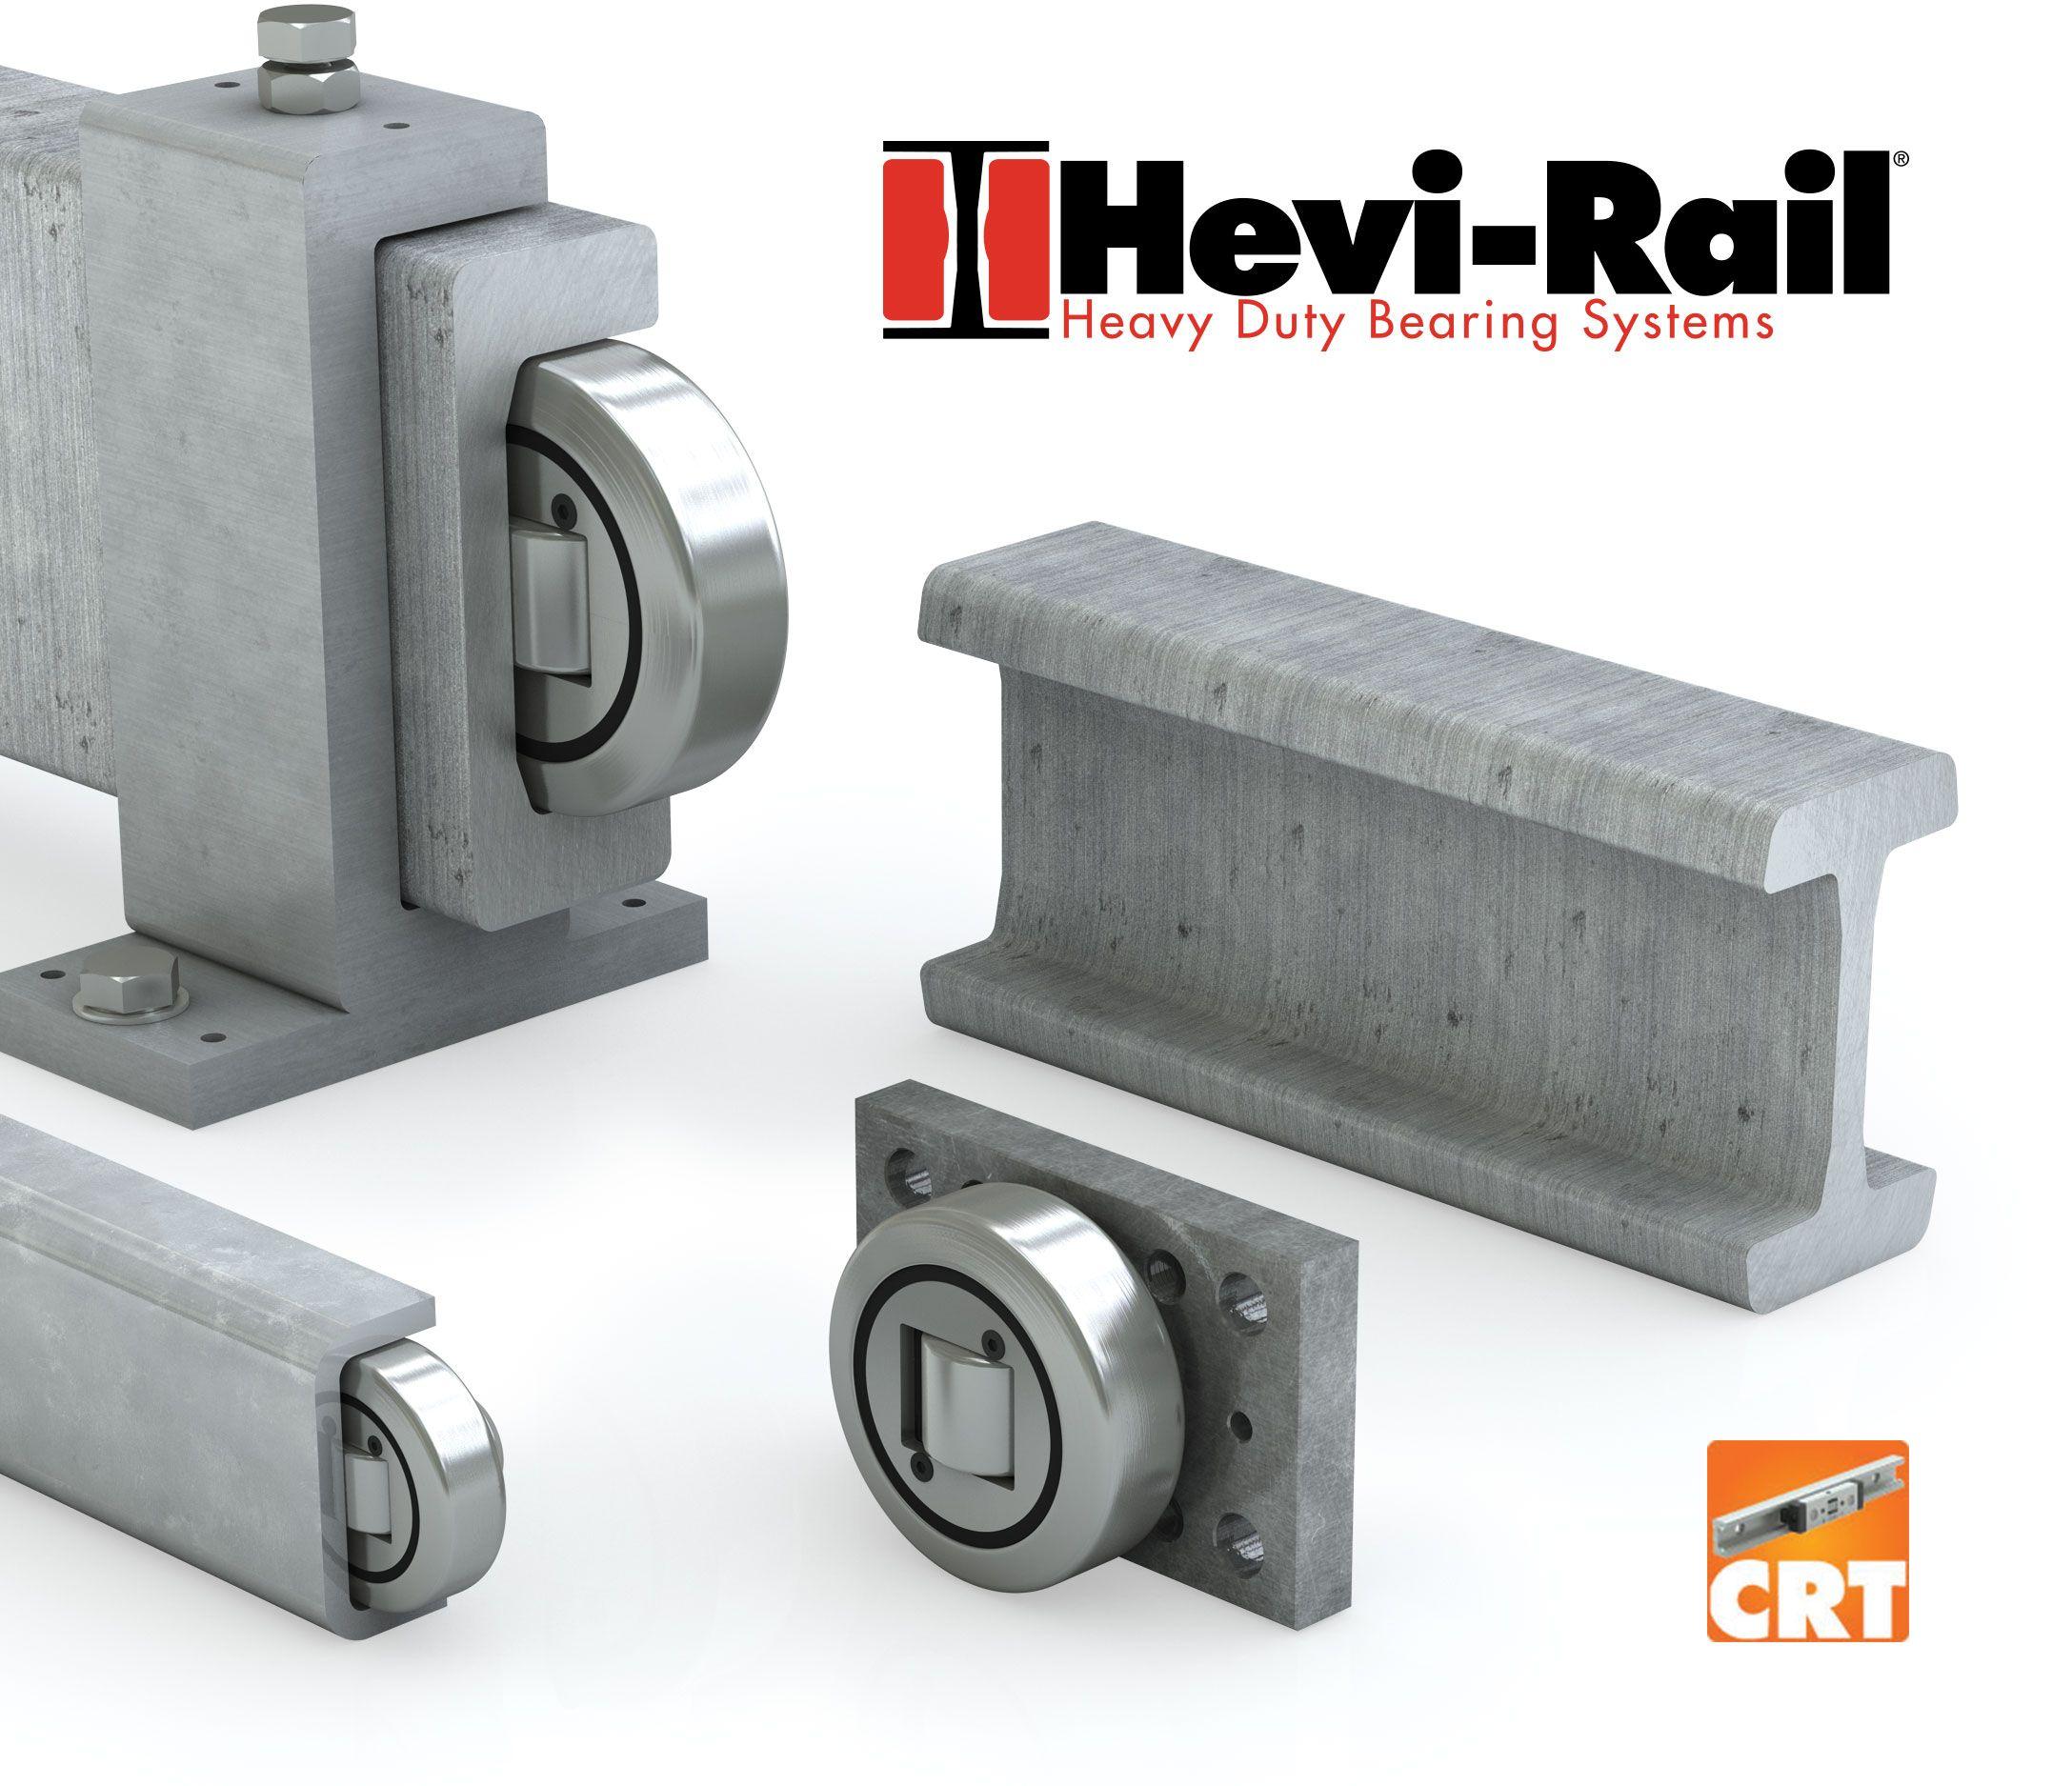 HeviRail The Heavy Duty Roller Bearing Truck bed